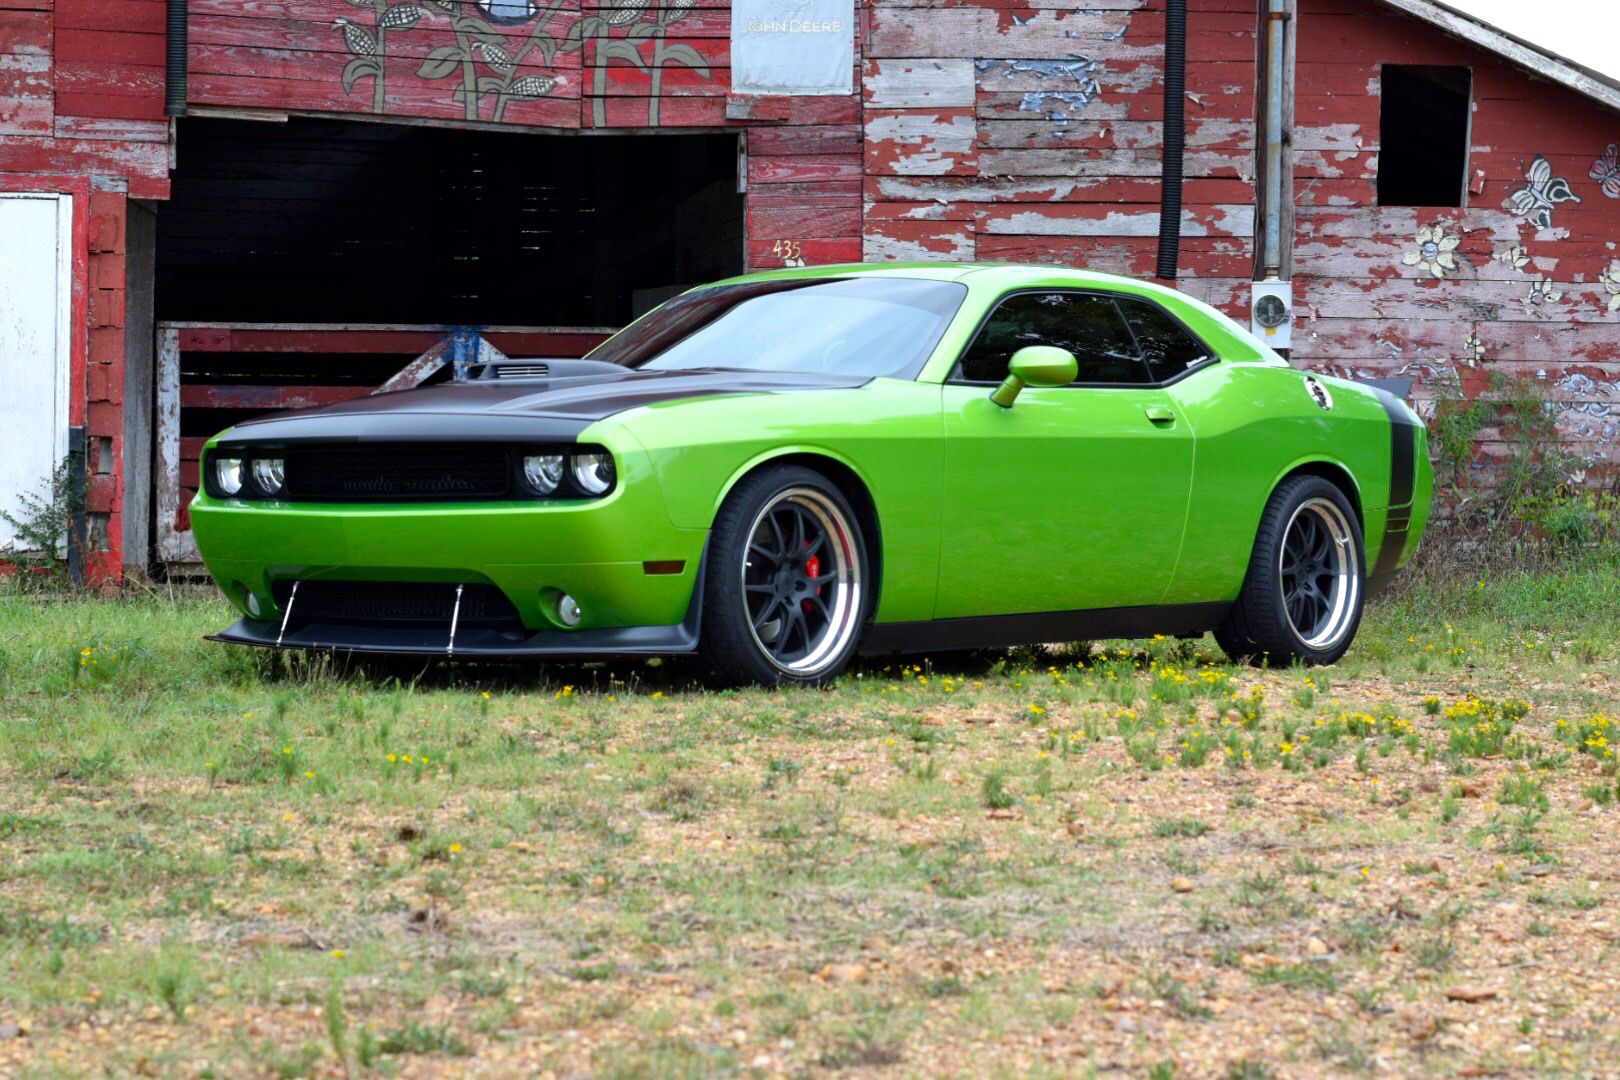 2011 Dodge Challenger | Adam Smith's Magnuson-Supercharged Dodge Challenger SRT on Forgeline GA3 Wheels